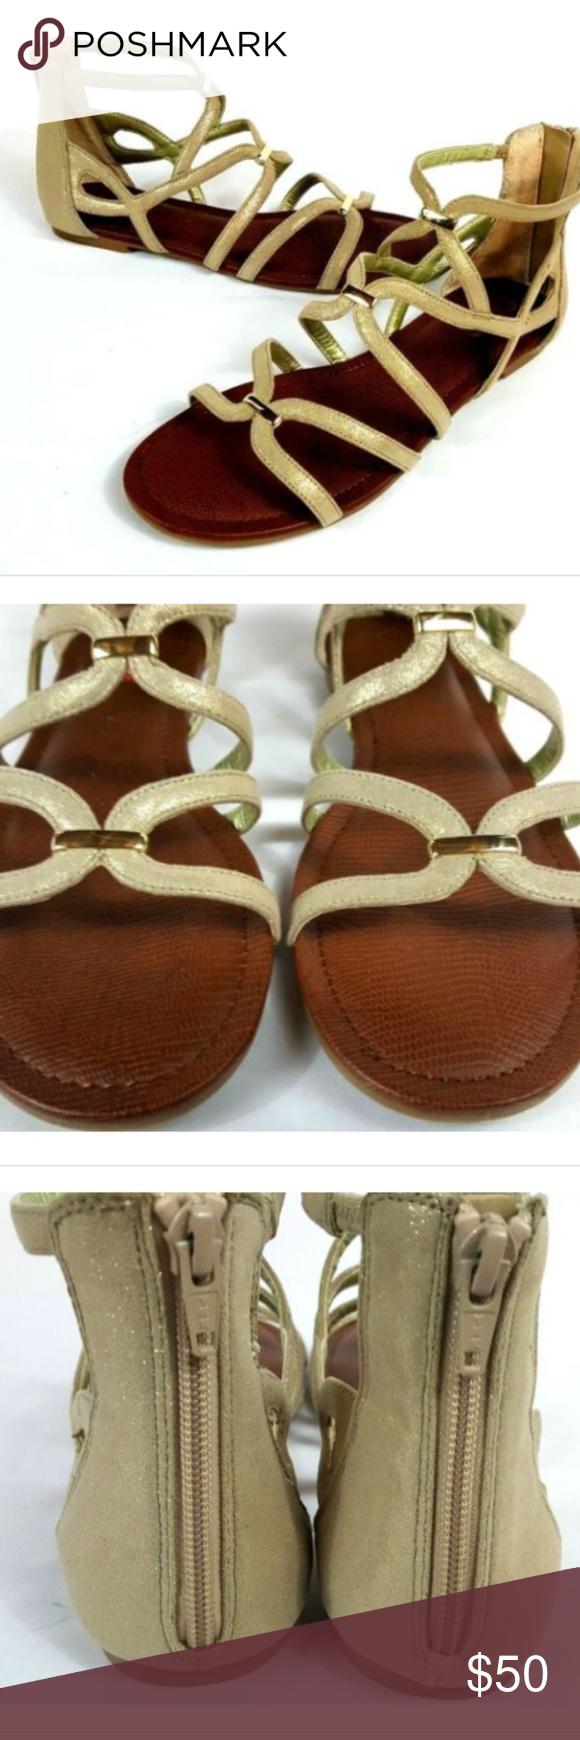 638446e4ff3 Carlos By Carlos Santana Women Shoes New Carlos Emma Kork Women Shoes Size  9 1 2 M Sandals Carlos by Carlos Santana Women s Emma Gladiator Sandal  Material  ...